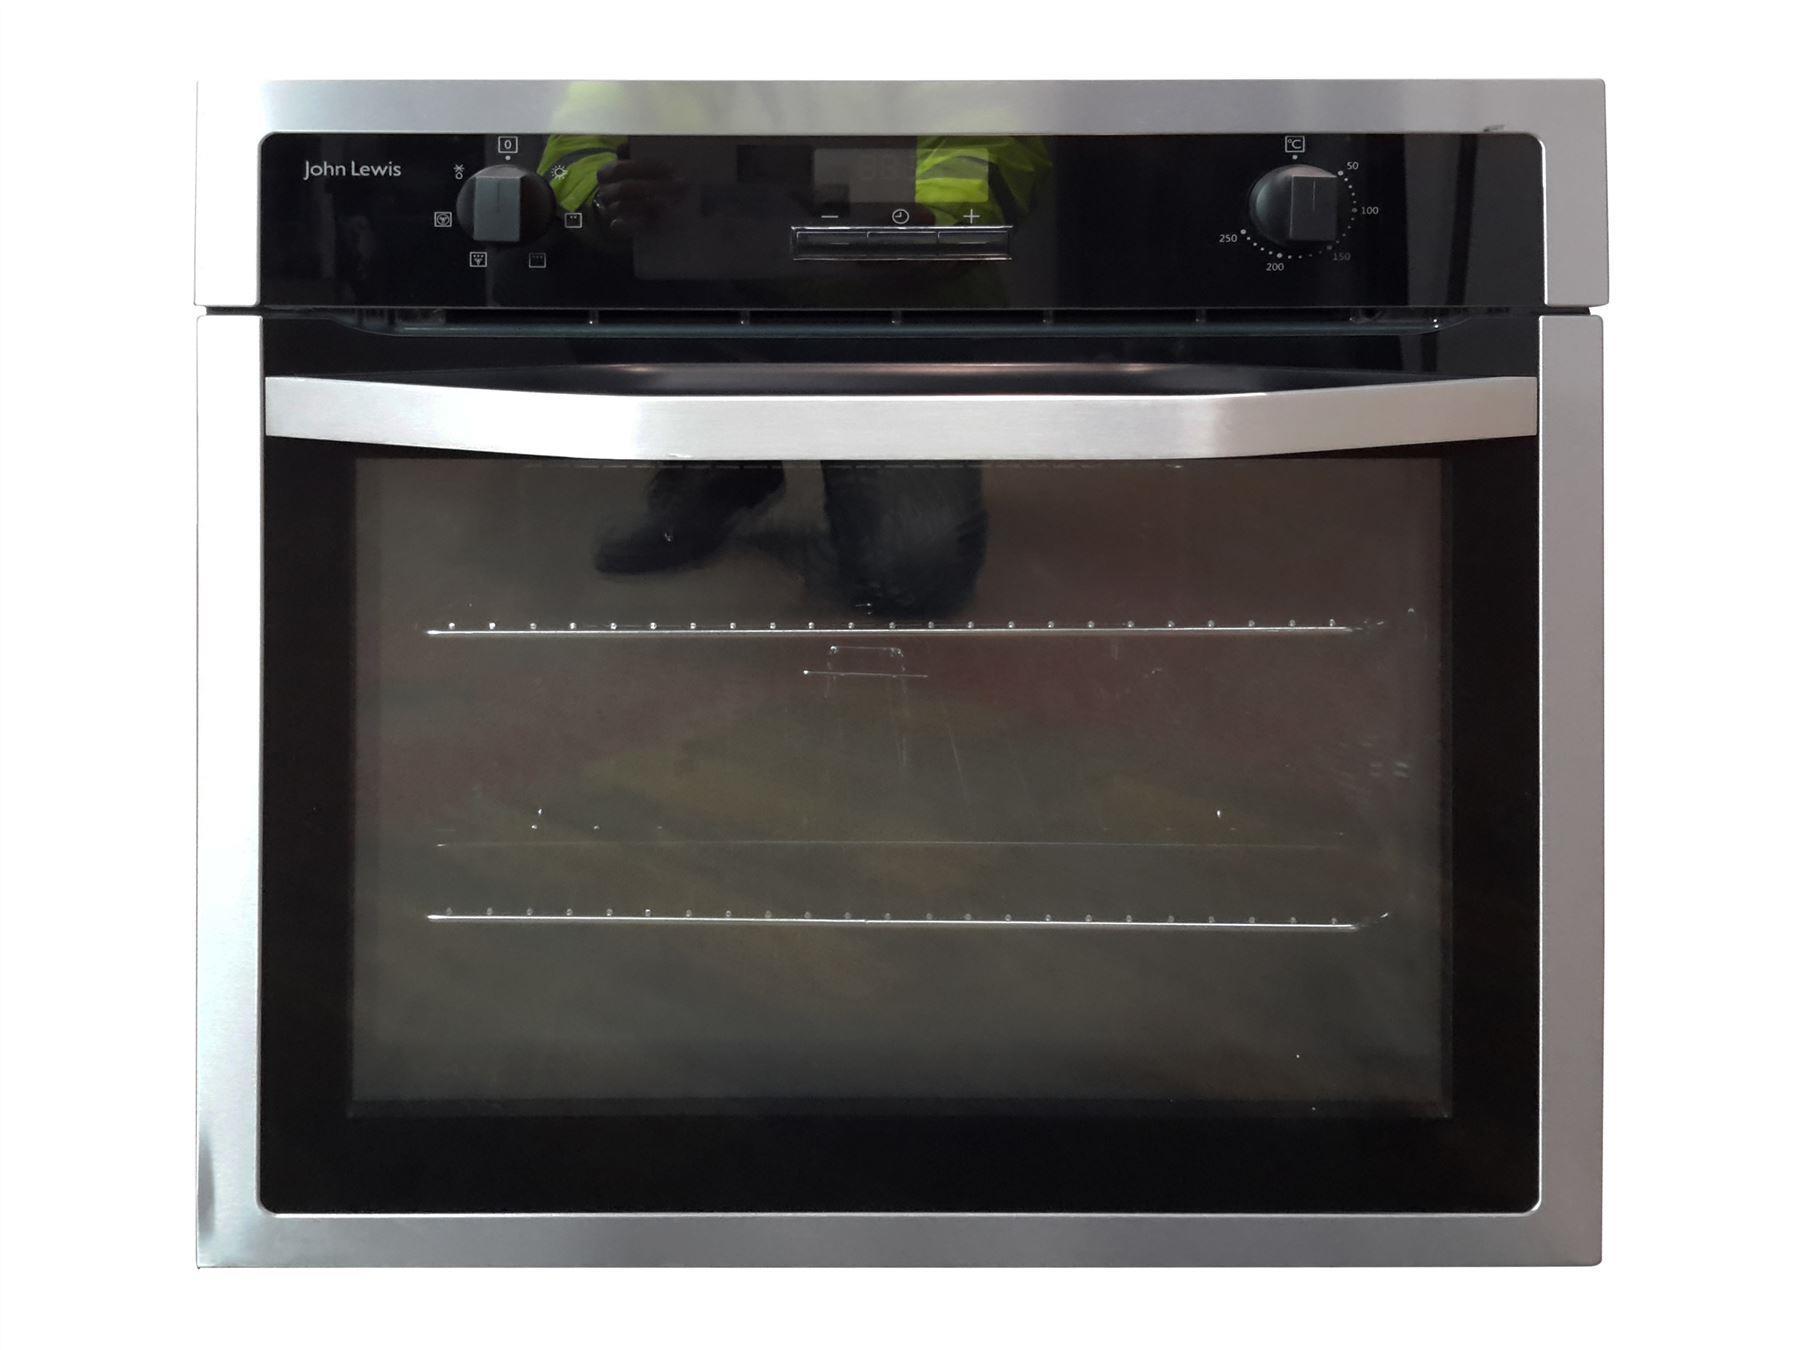 john lewis jlbios621 electric single oven black stainless. Black Bedroom Furniture Sets. Home Design Ideas